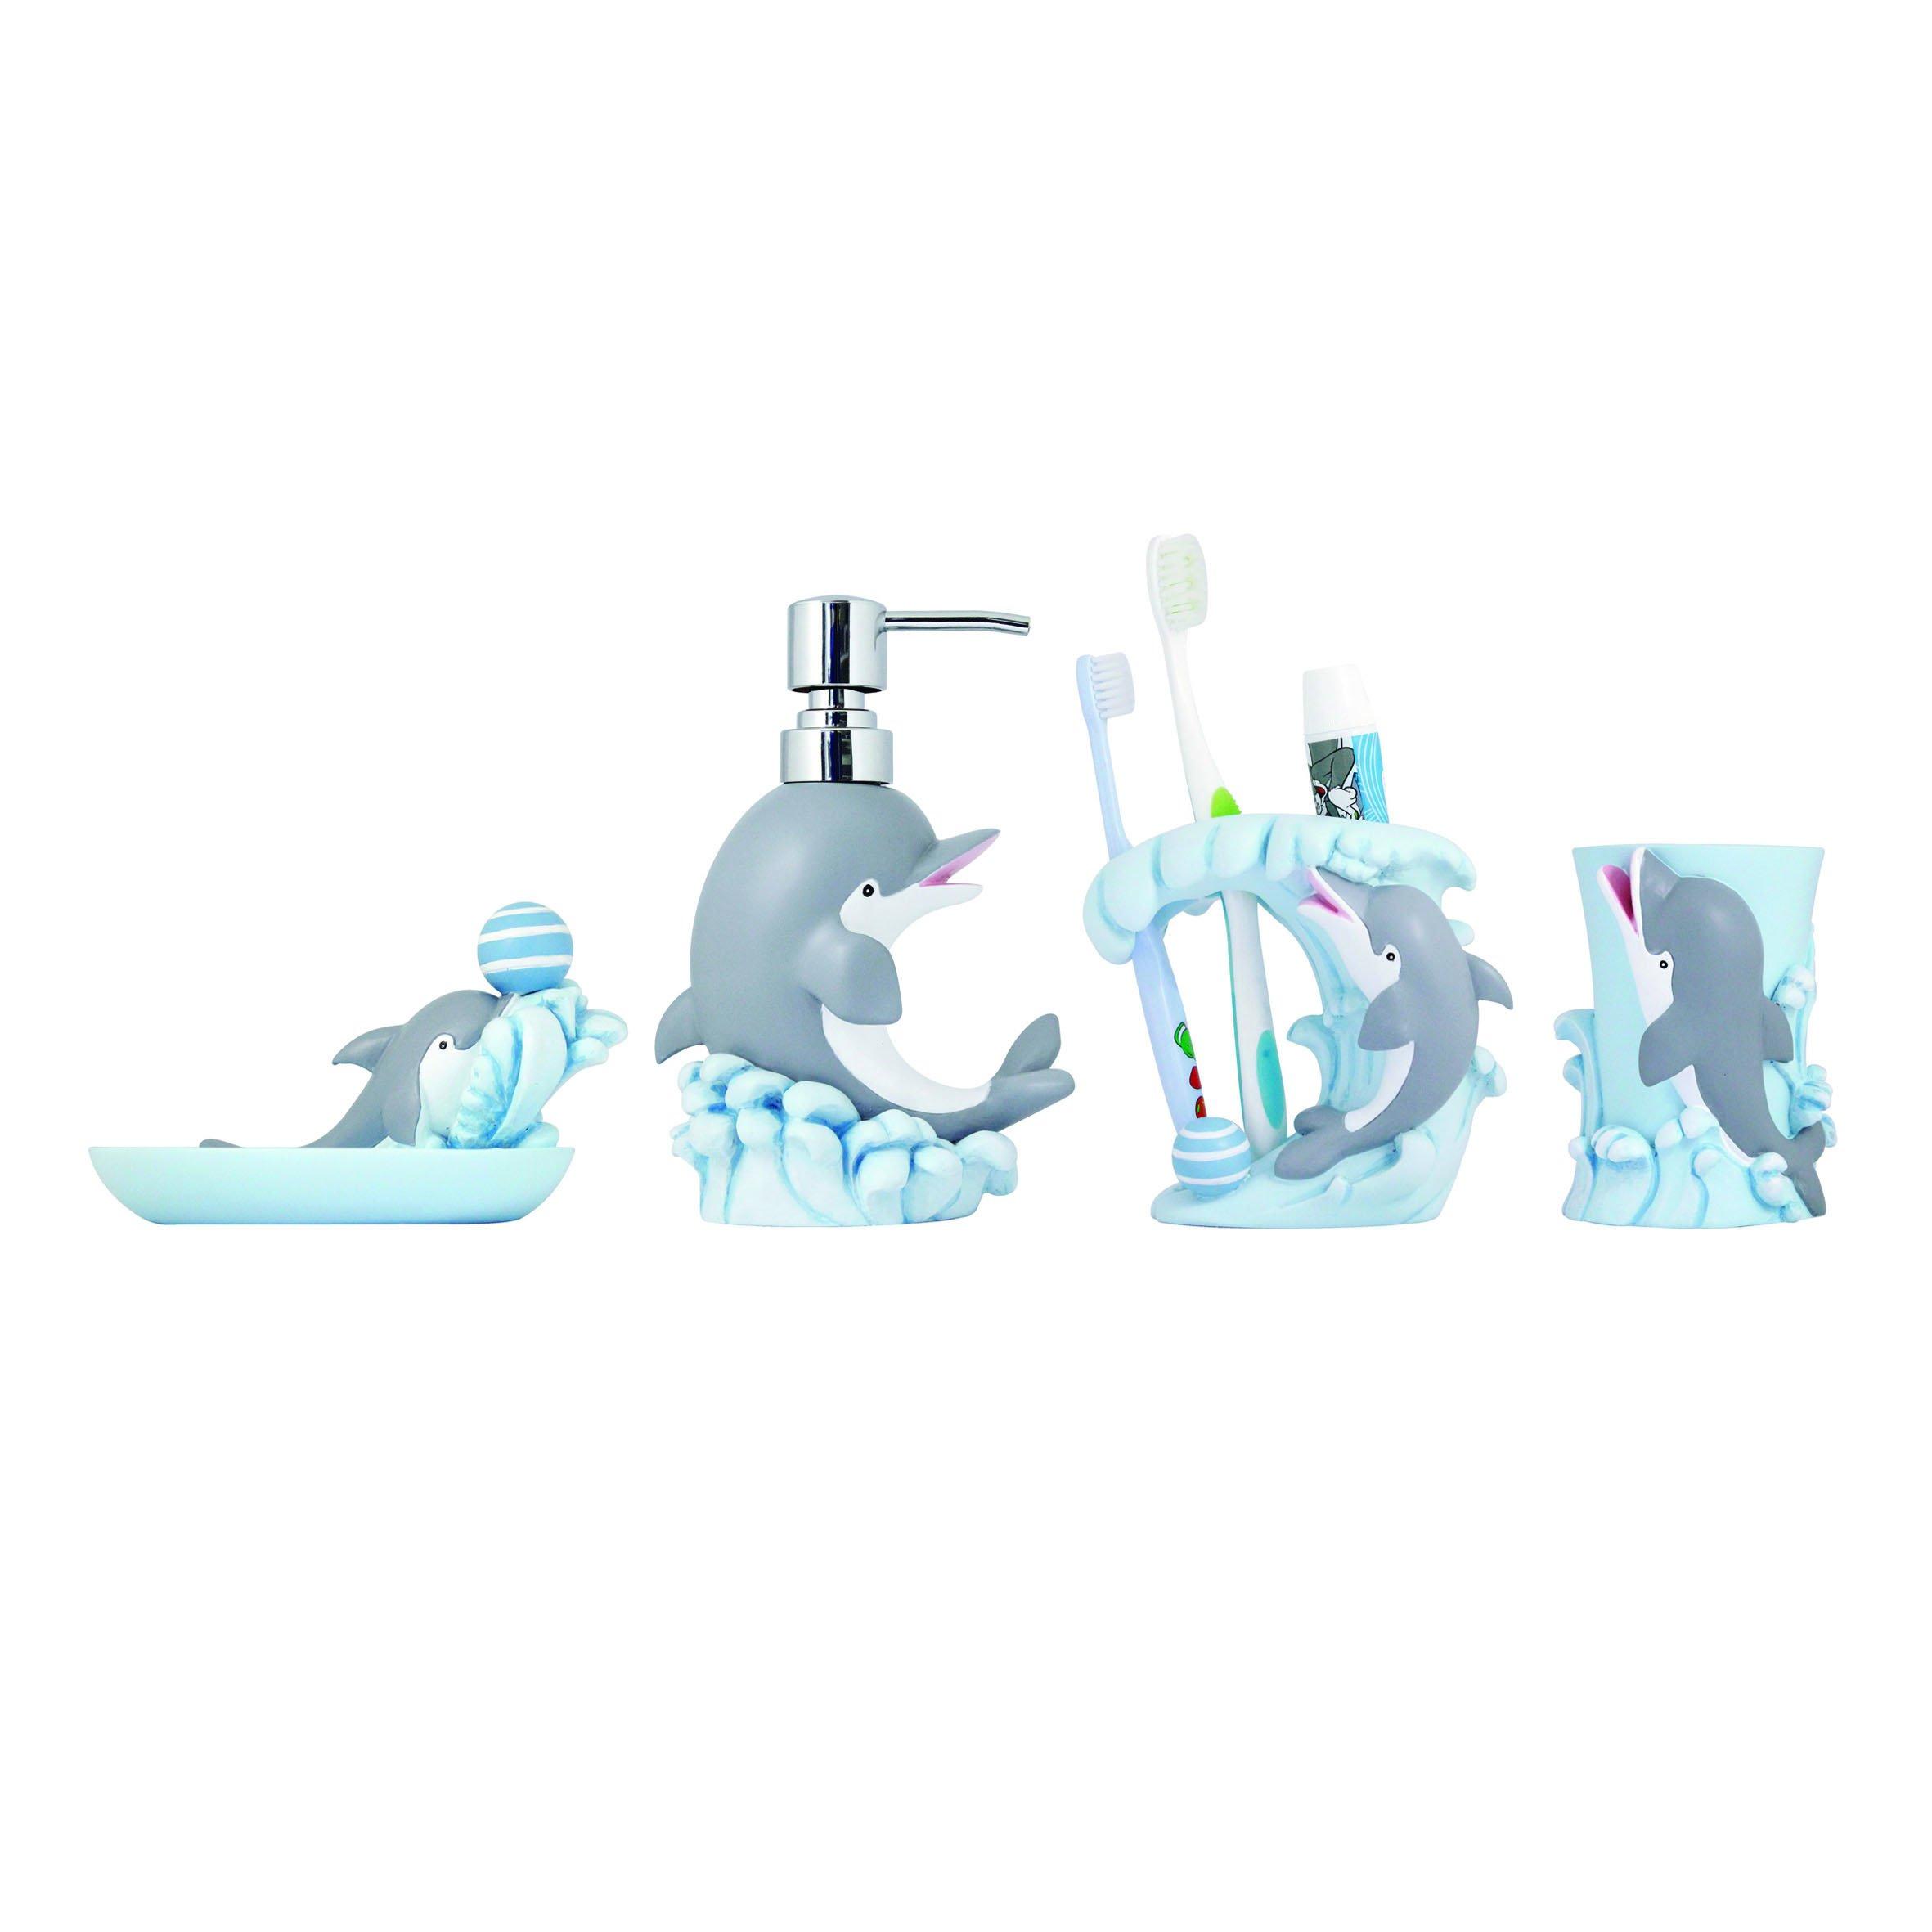 MODONA Four Piece KIDS Bathroom Accessories Set - Dolphin